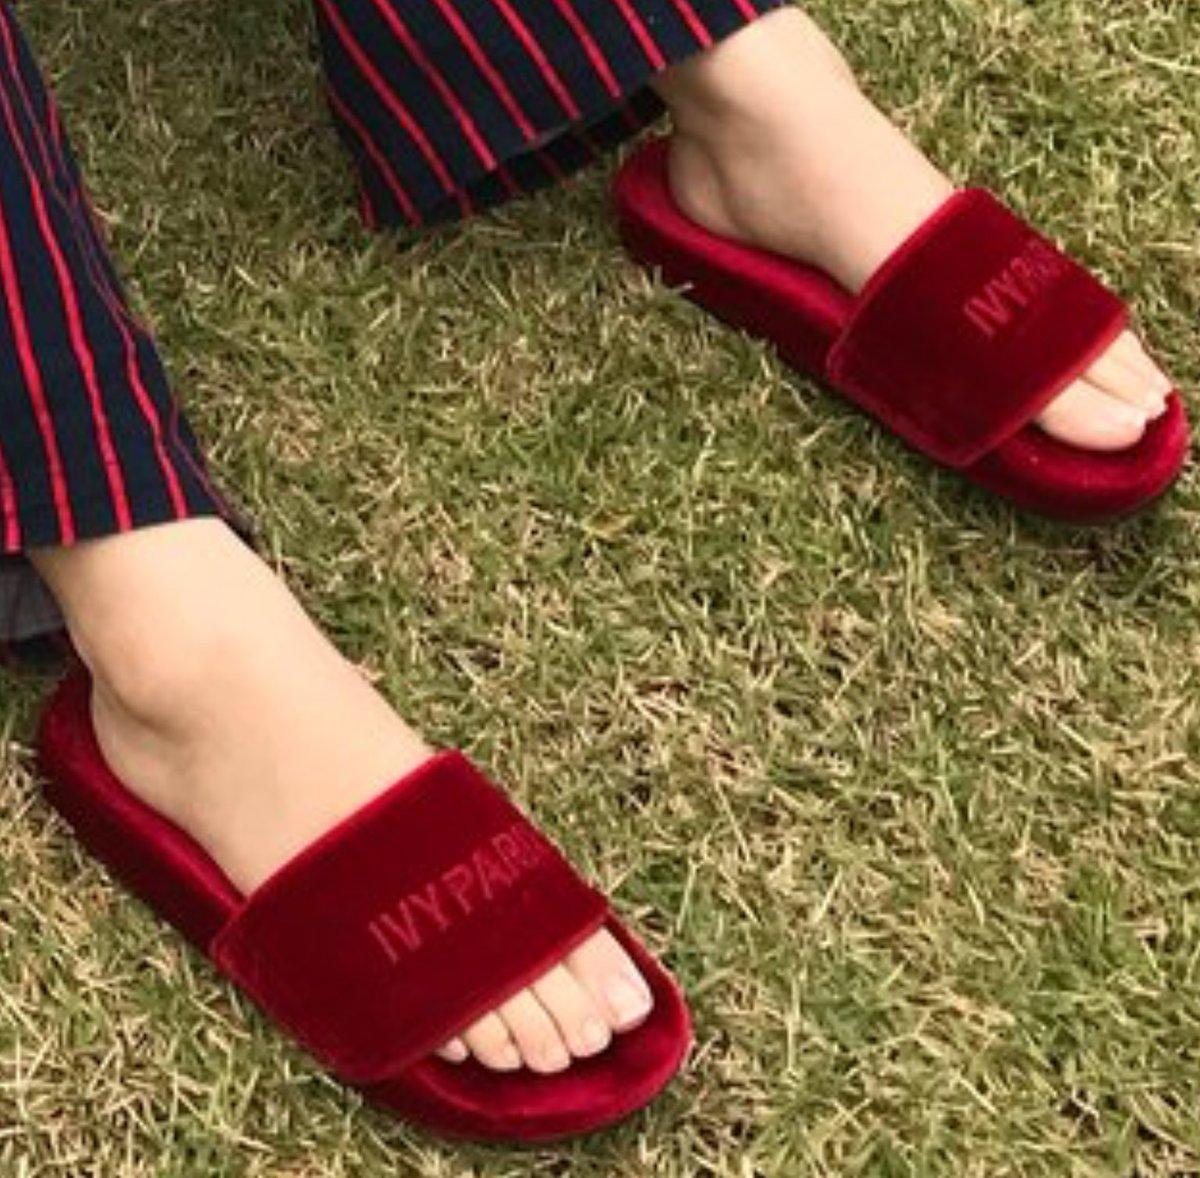 75f72f68409 Yerim is wearing IVY PARK Red Velvet slippers by  Beyoncépic.twitter.com xeK5pqo61m